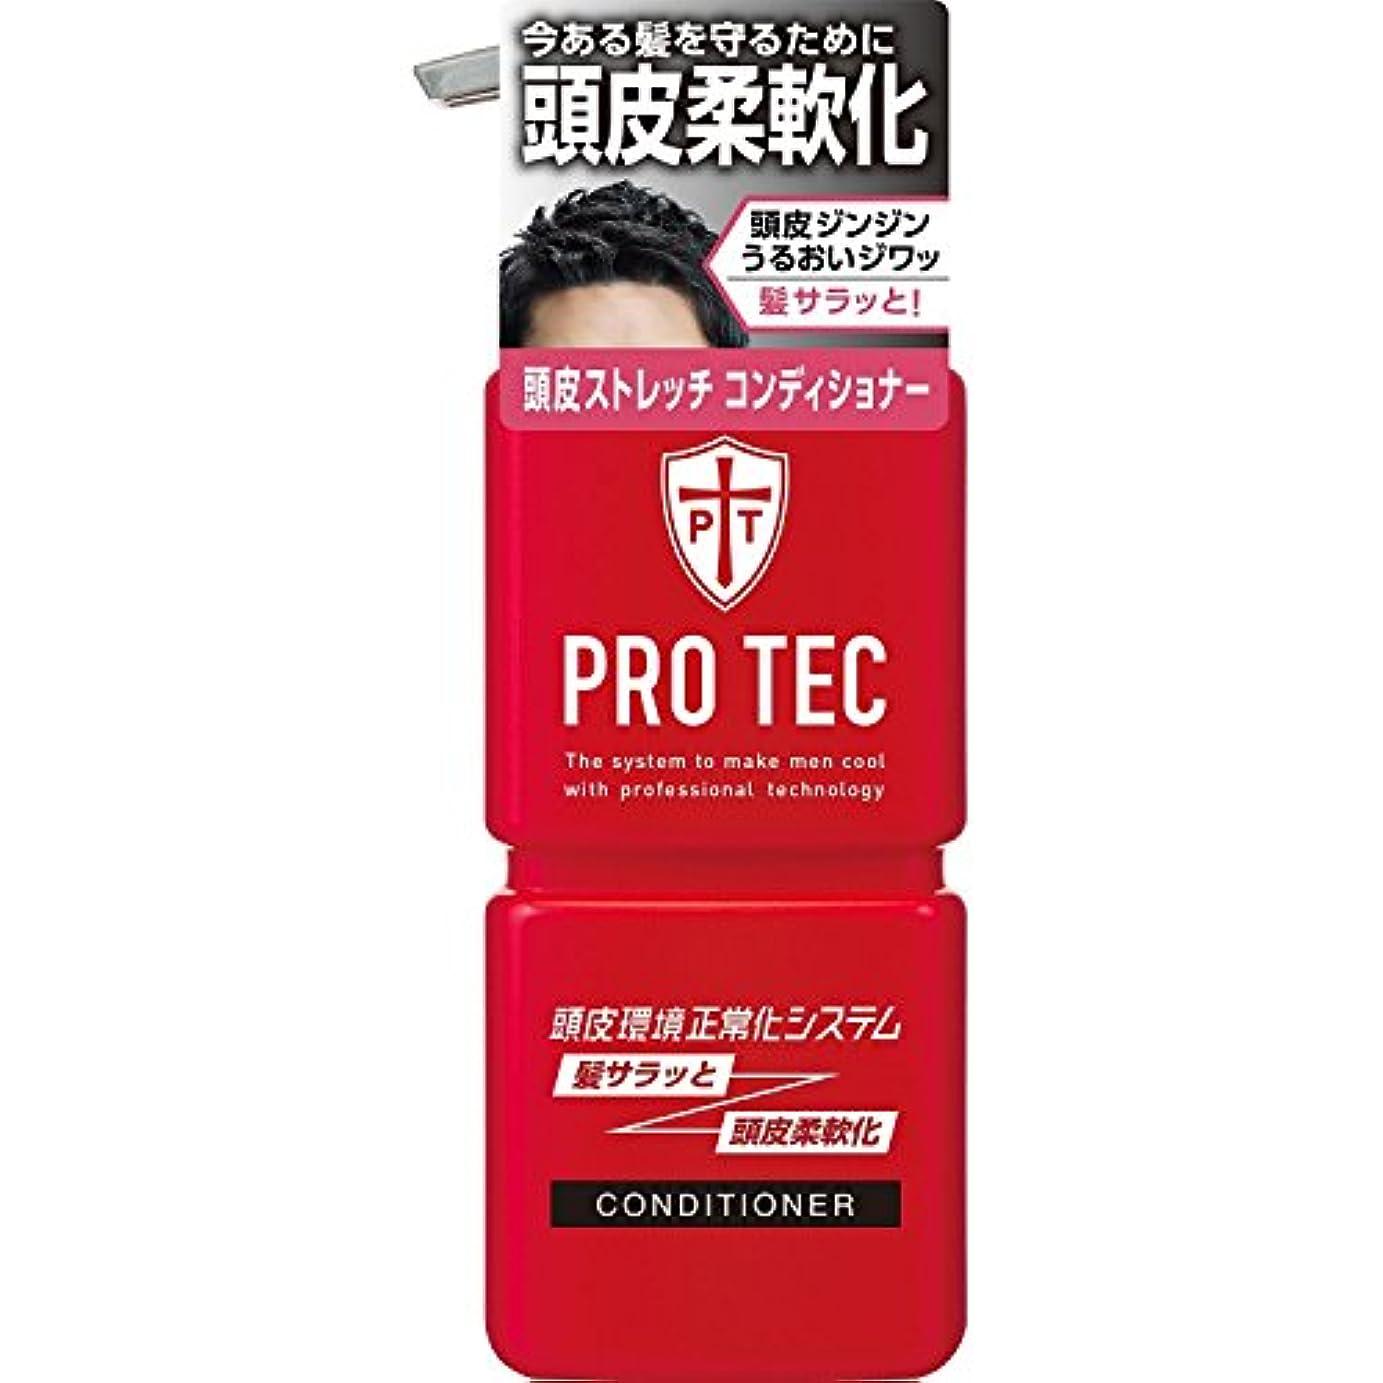 PRO TEC(プロテク) 頭皮ストレッチ コンディショナー 本体ポンプ 300g